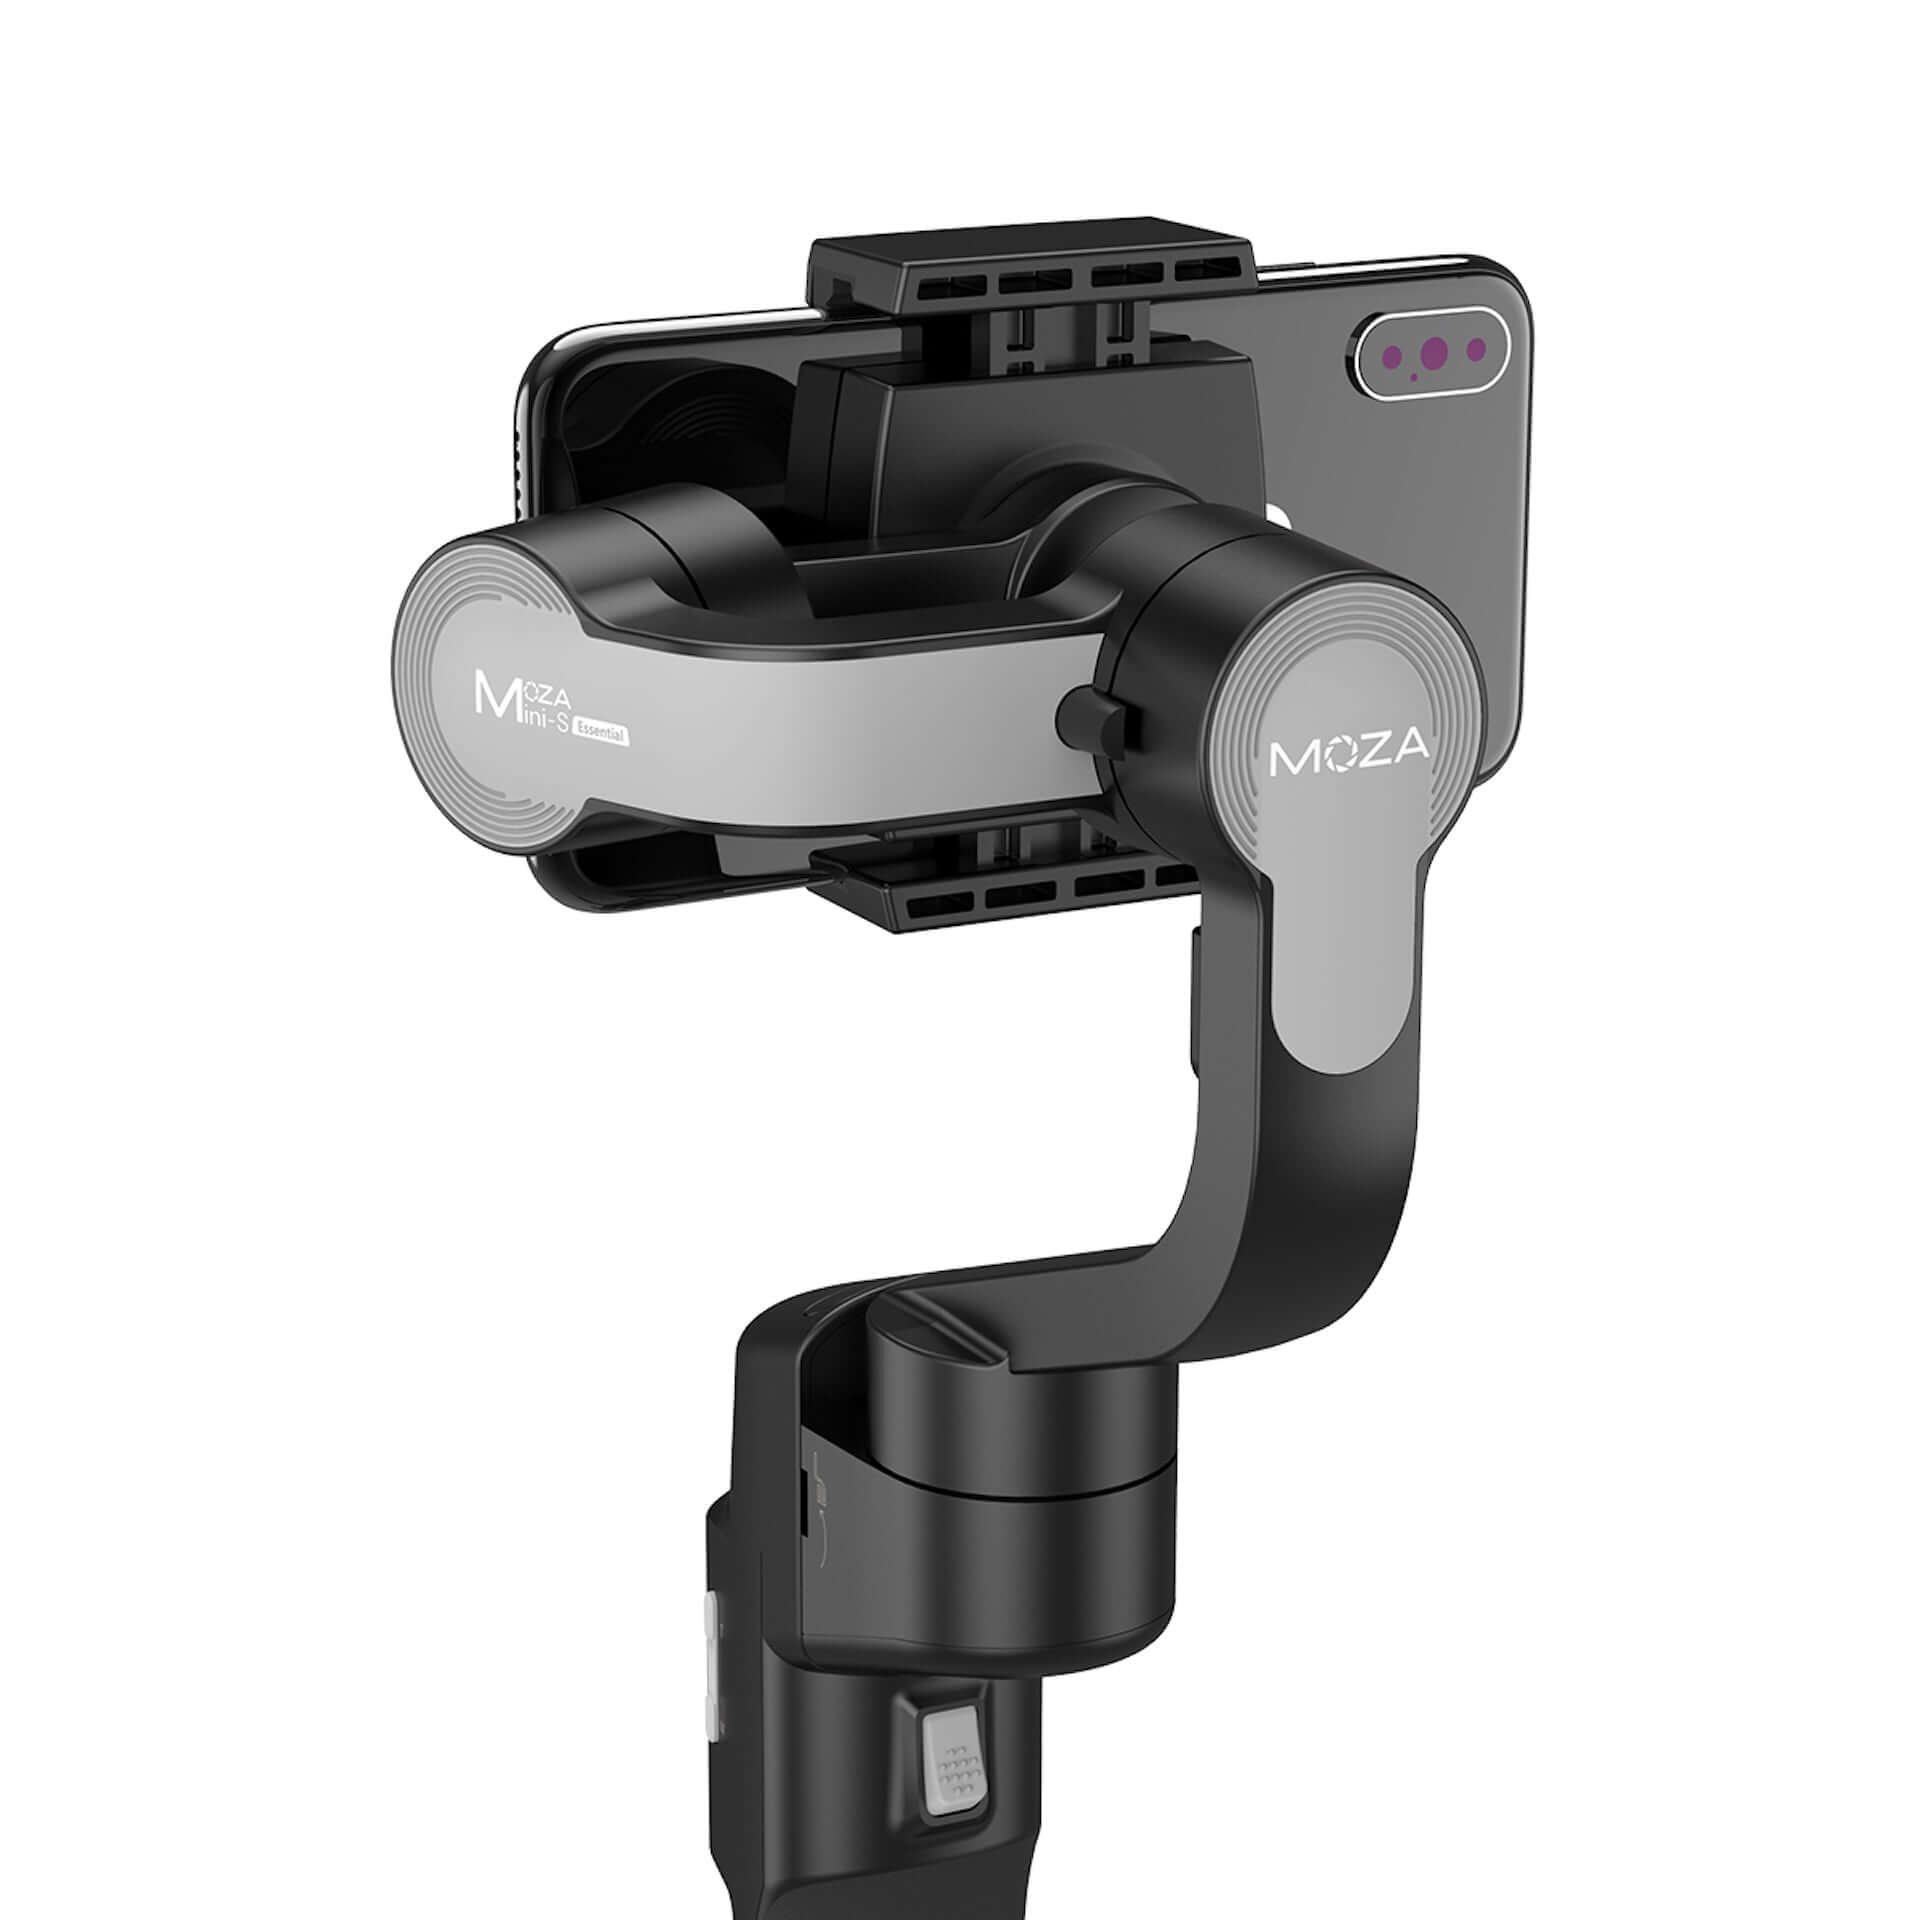 USB Type-Cでの給電も可能な本格スマホスタビライザー「MOZA Mini-SE」が登場 tech190710_mozamini_se_3-1920x1920